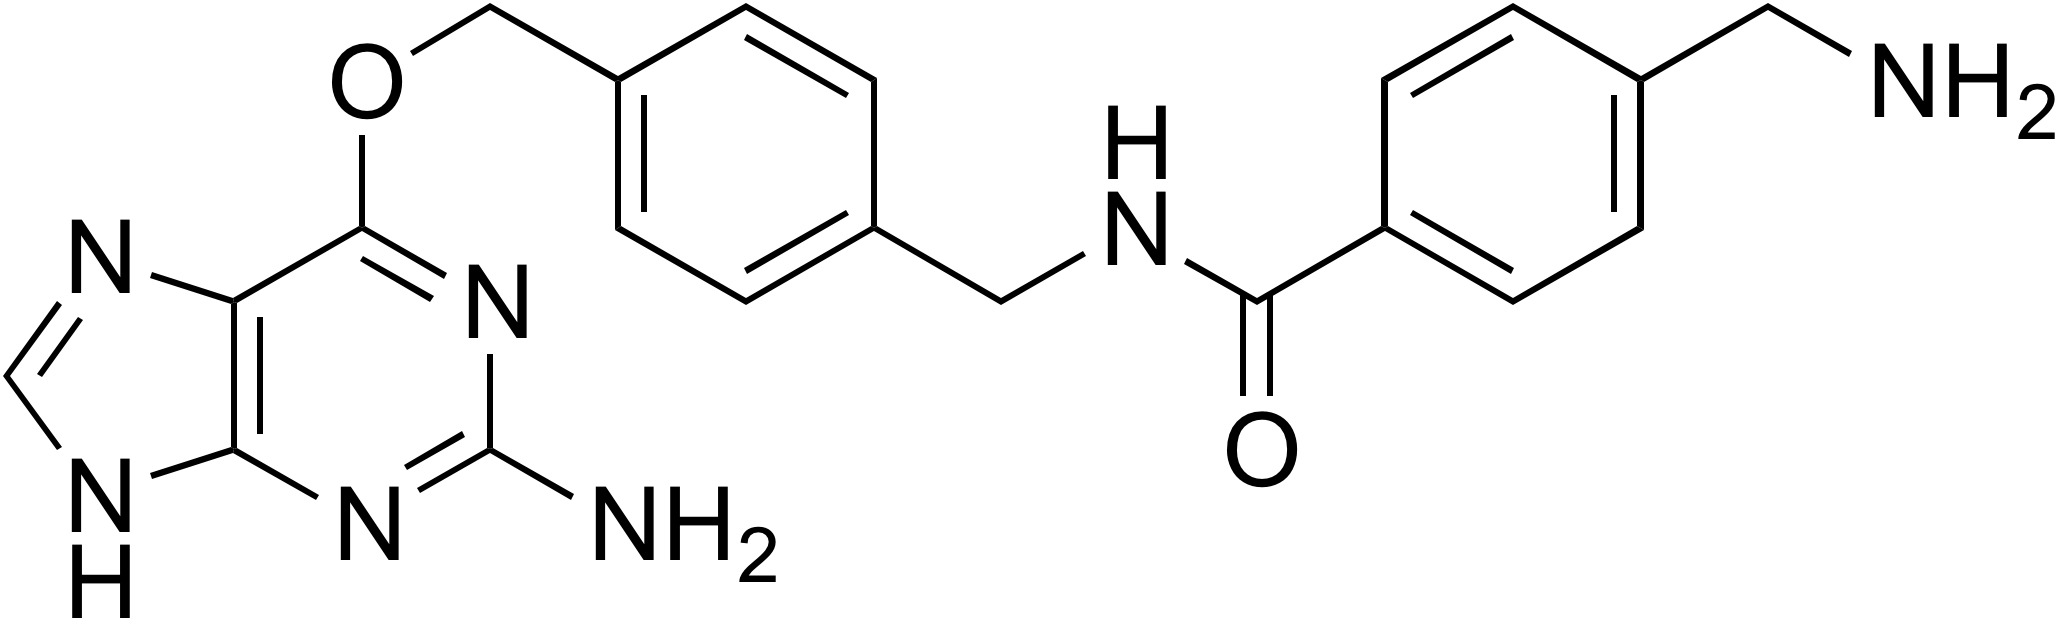 N-(4-((2-Amino-9H-purin-6-yloxy)methyl)benzyl)-4-(aminomethyl)benzamide